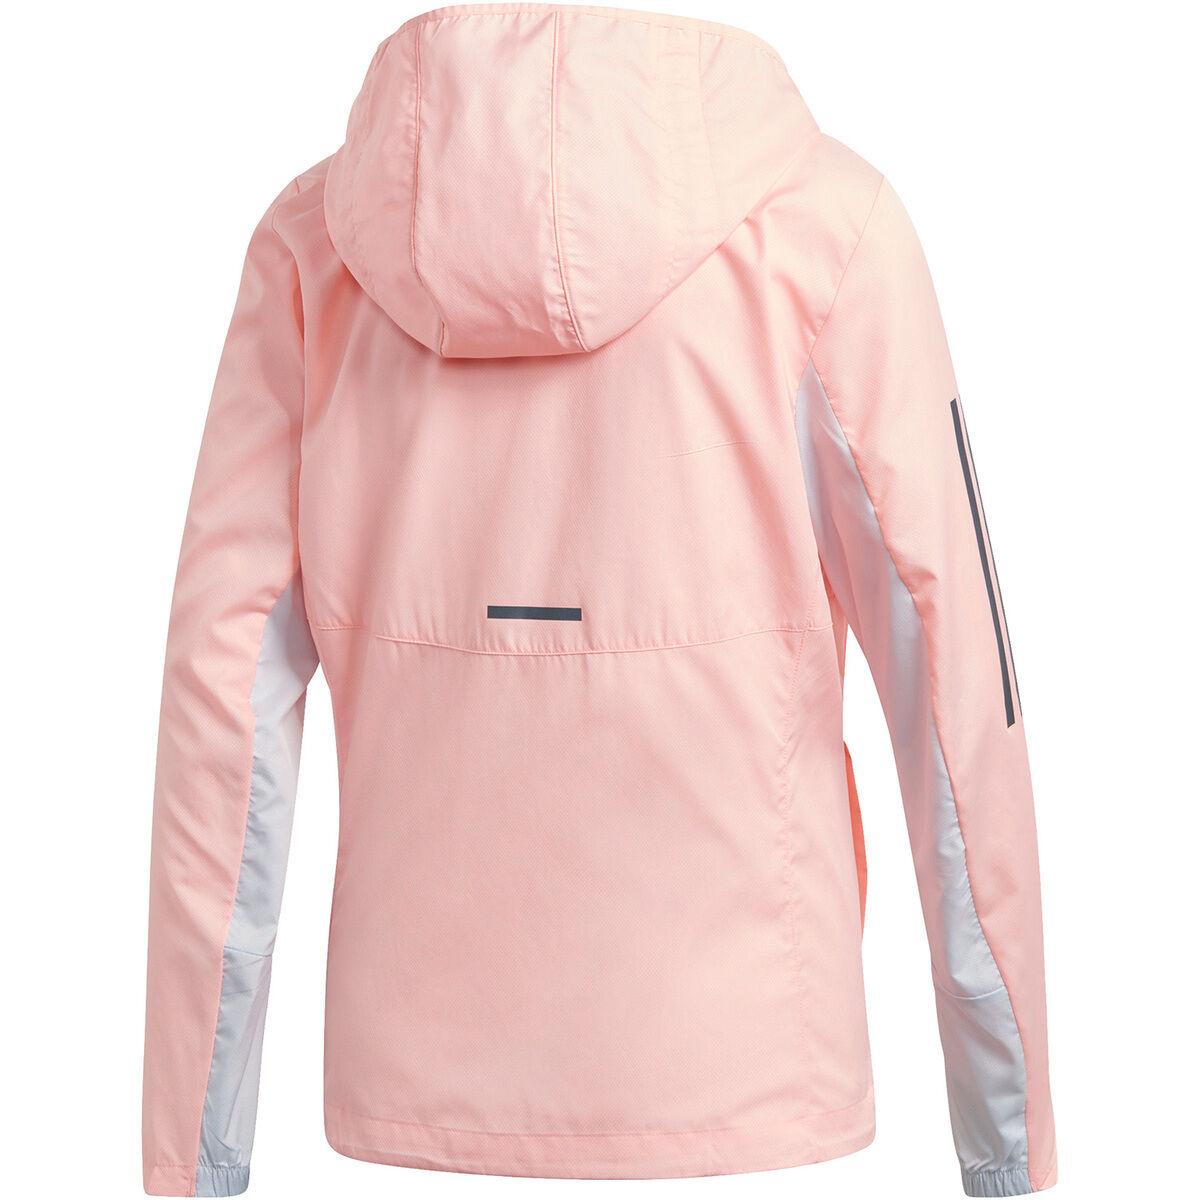 Adidas Damen Own The Run Jacket Laufjacke rosa | eBay